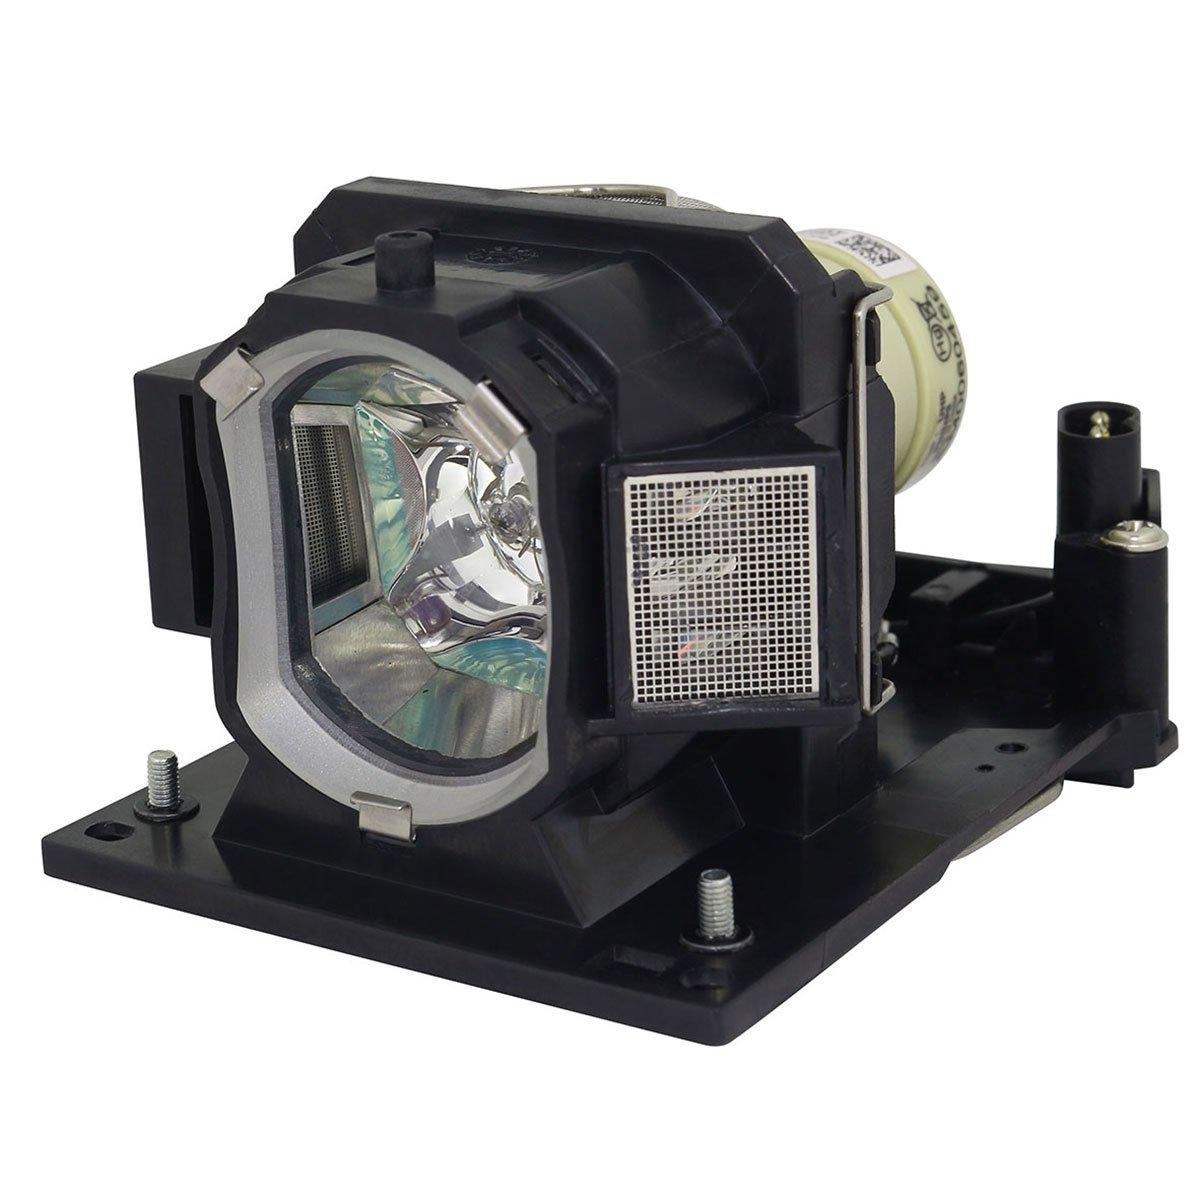 Lutema OEM 交換用ランプ ハウジング/電球付き Dukane 456-8931WA用 Platinum (Brighter/Durable) Platinum (Brighter/Durable) Lamp with Housing B07KTLMTLG